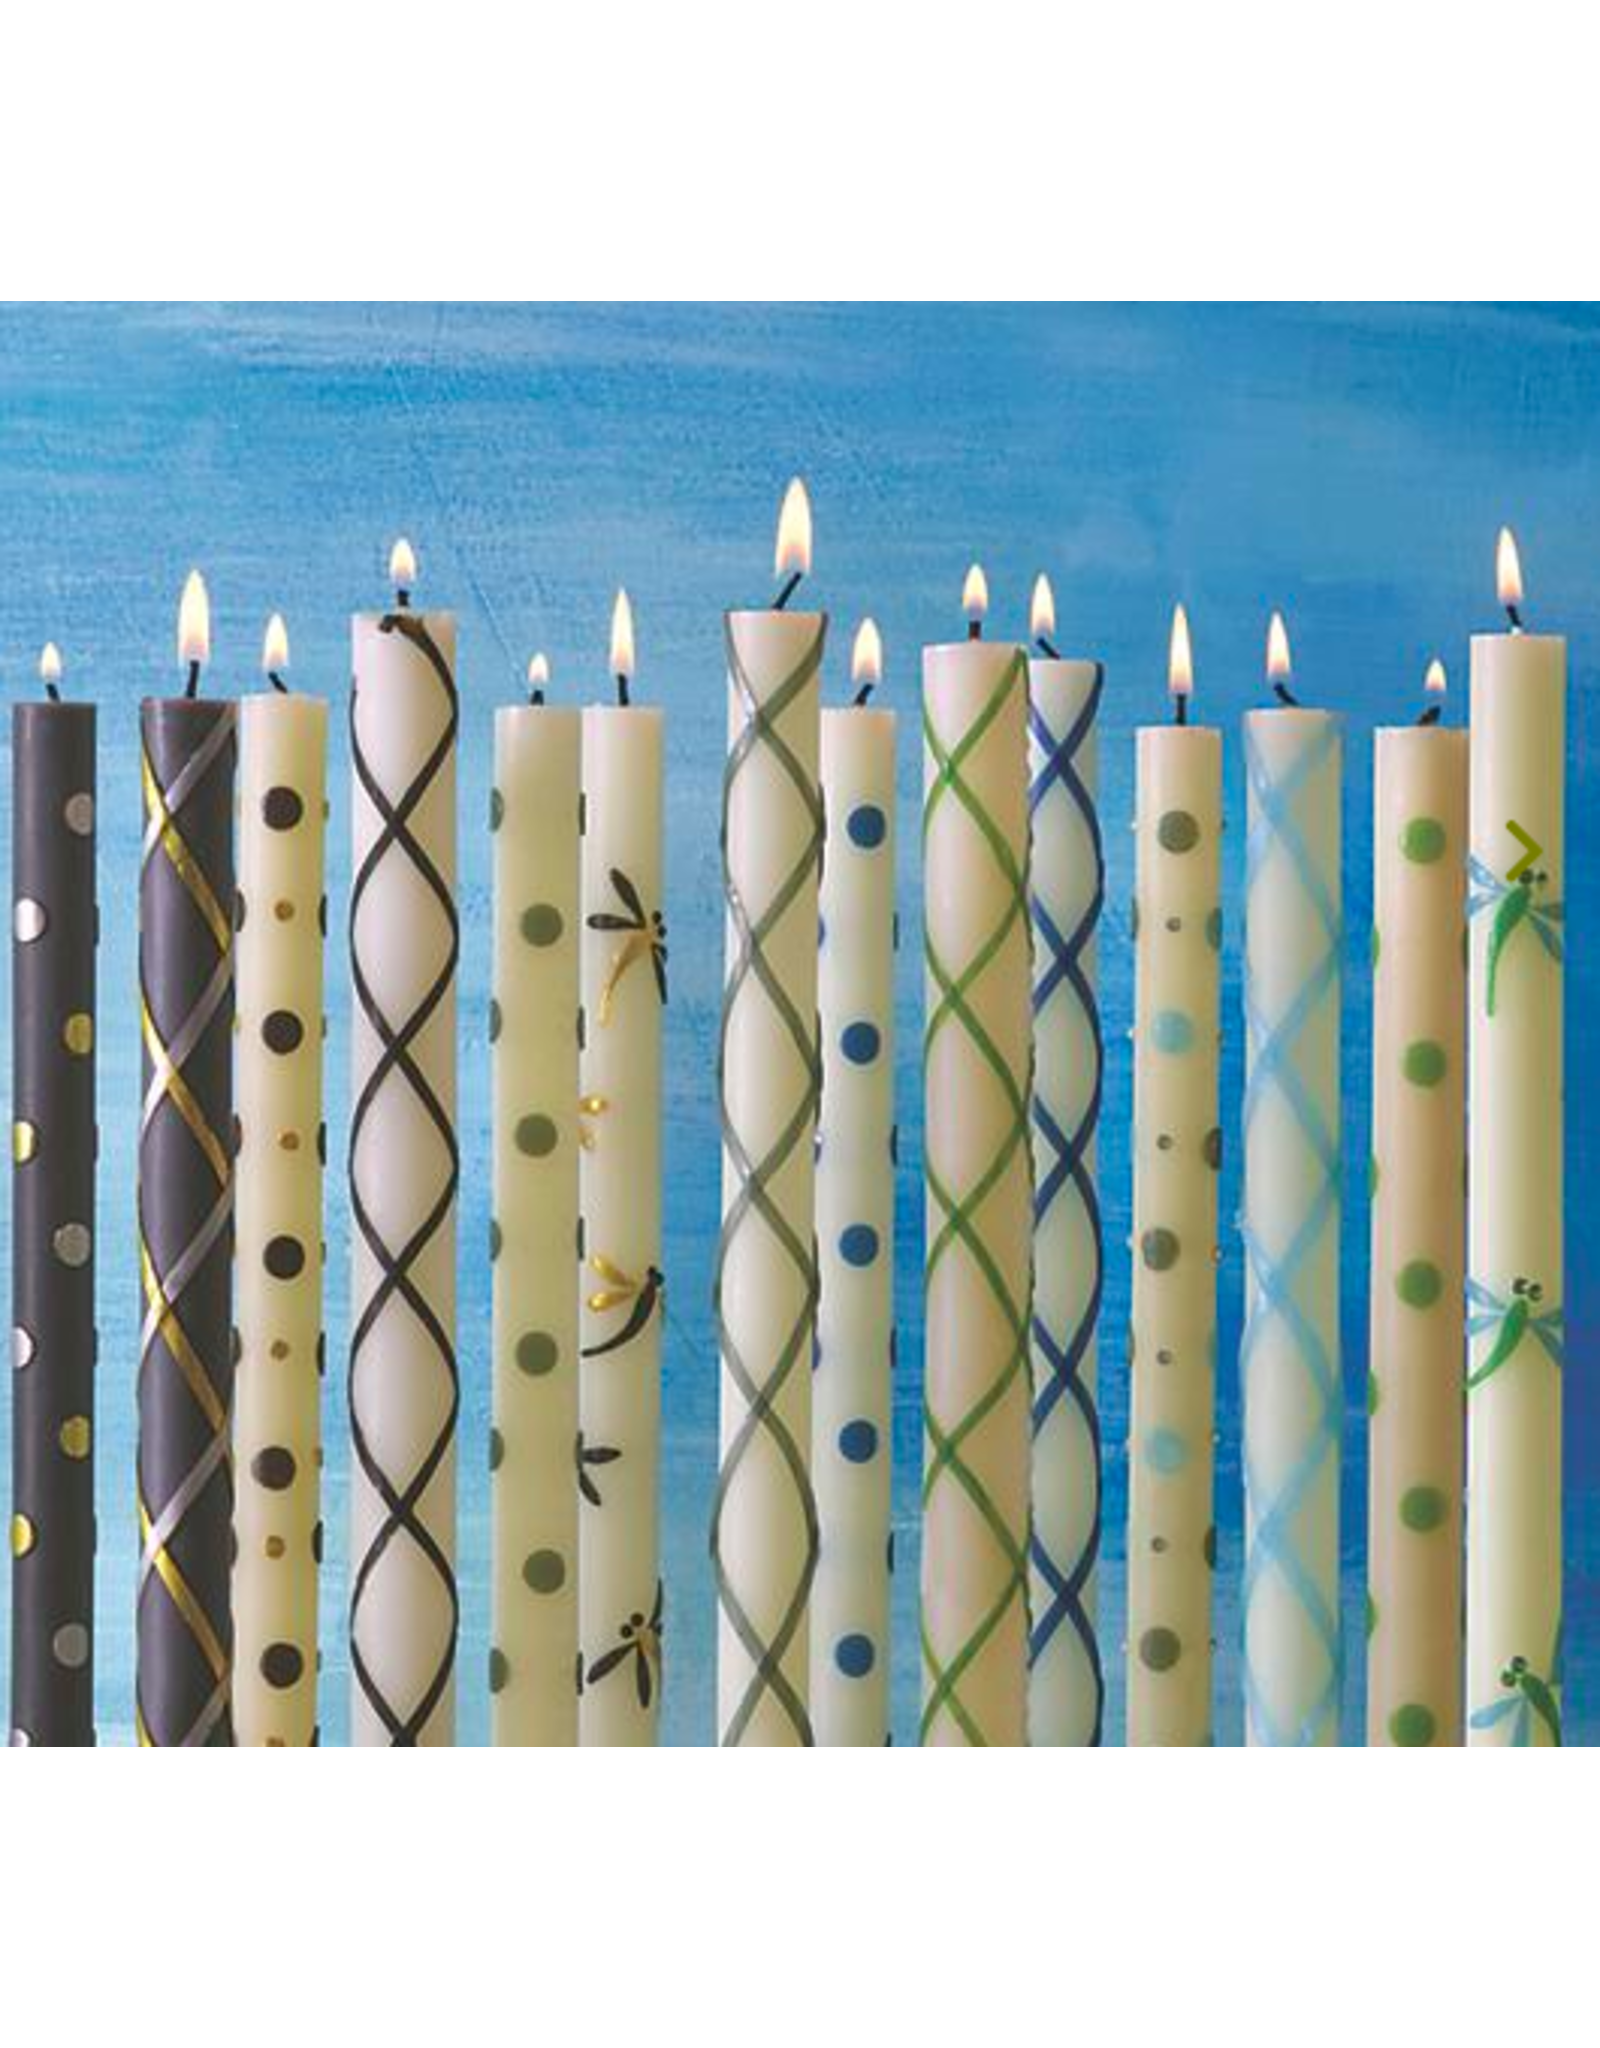 MacKenzie Childs Dot Dinner Candles in Navy by MacKenzie-Childs